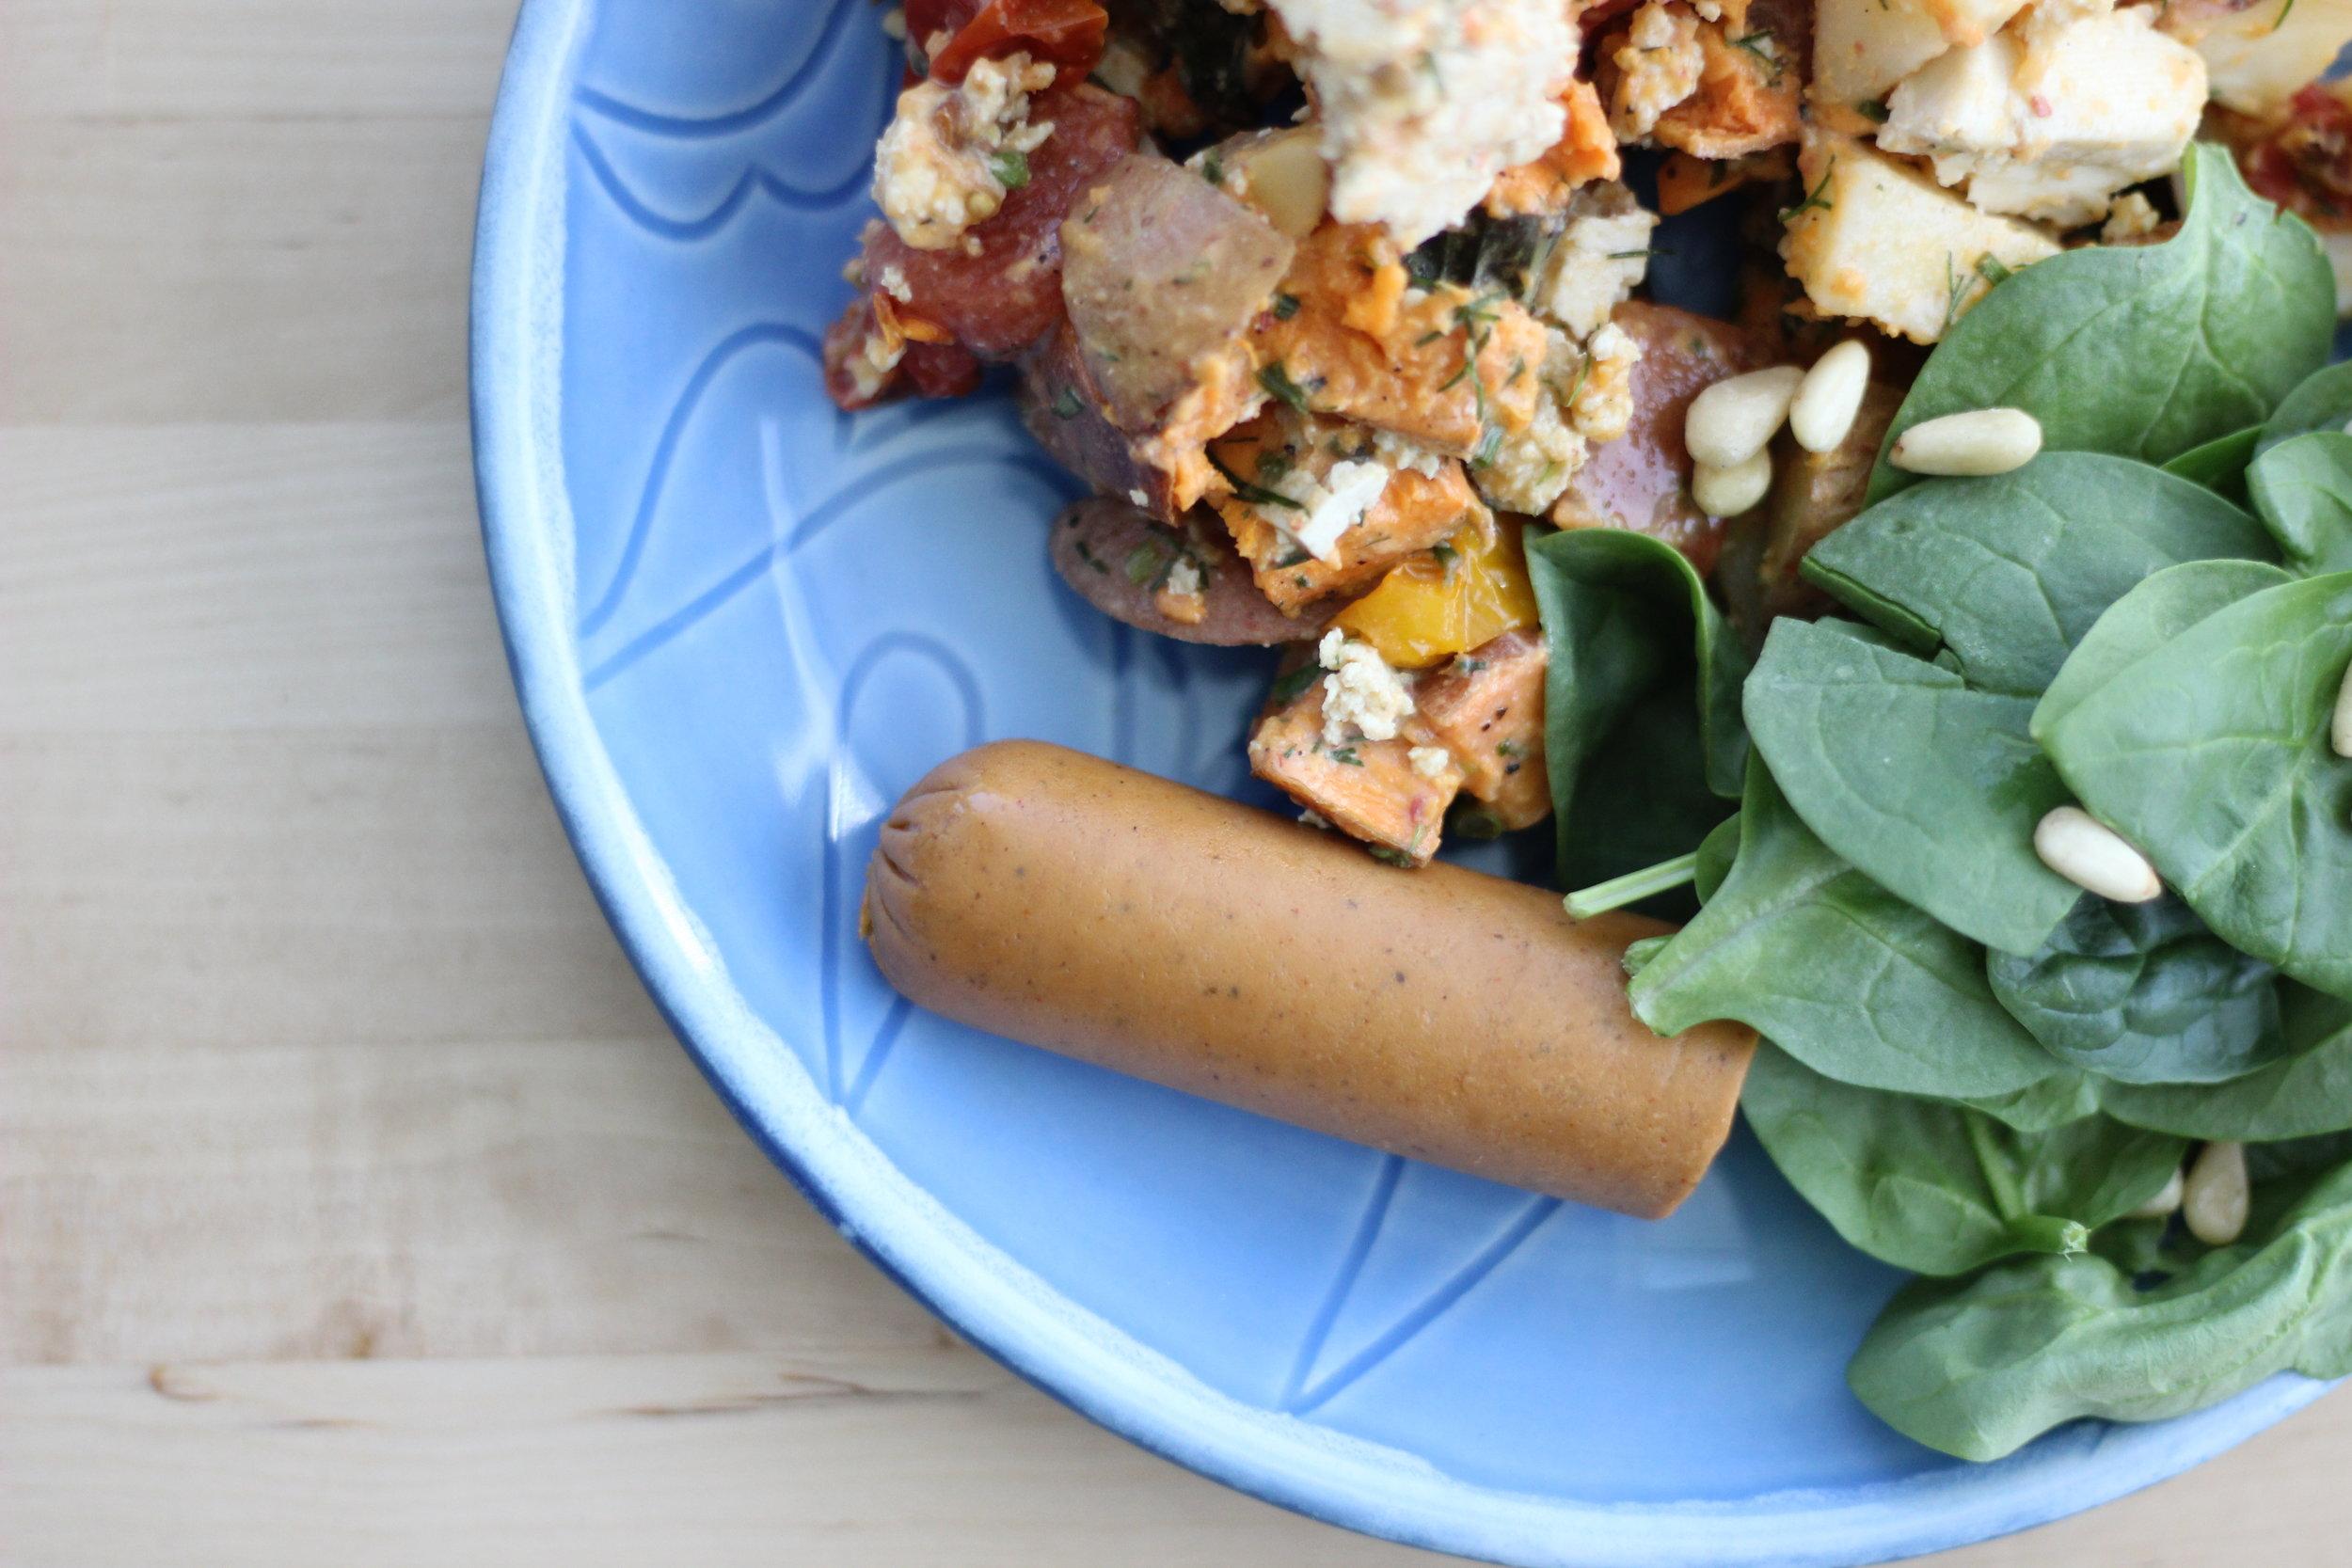 herby potato salad plated3.jpg